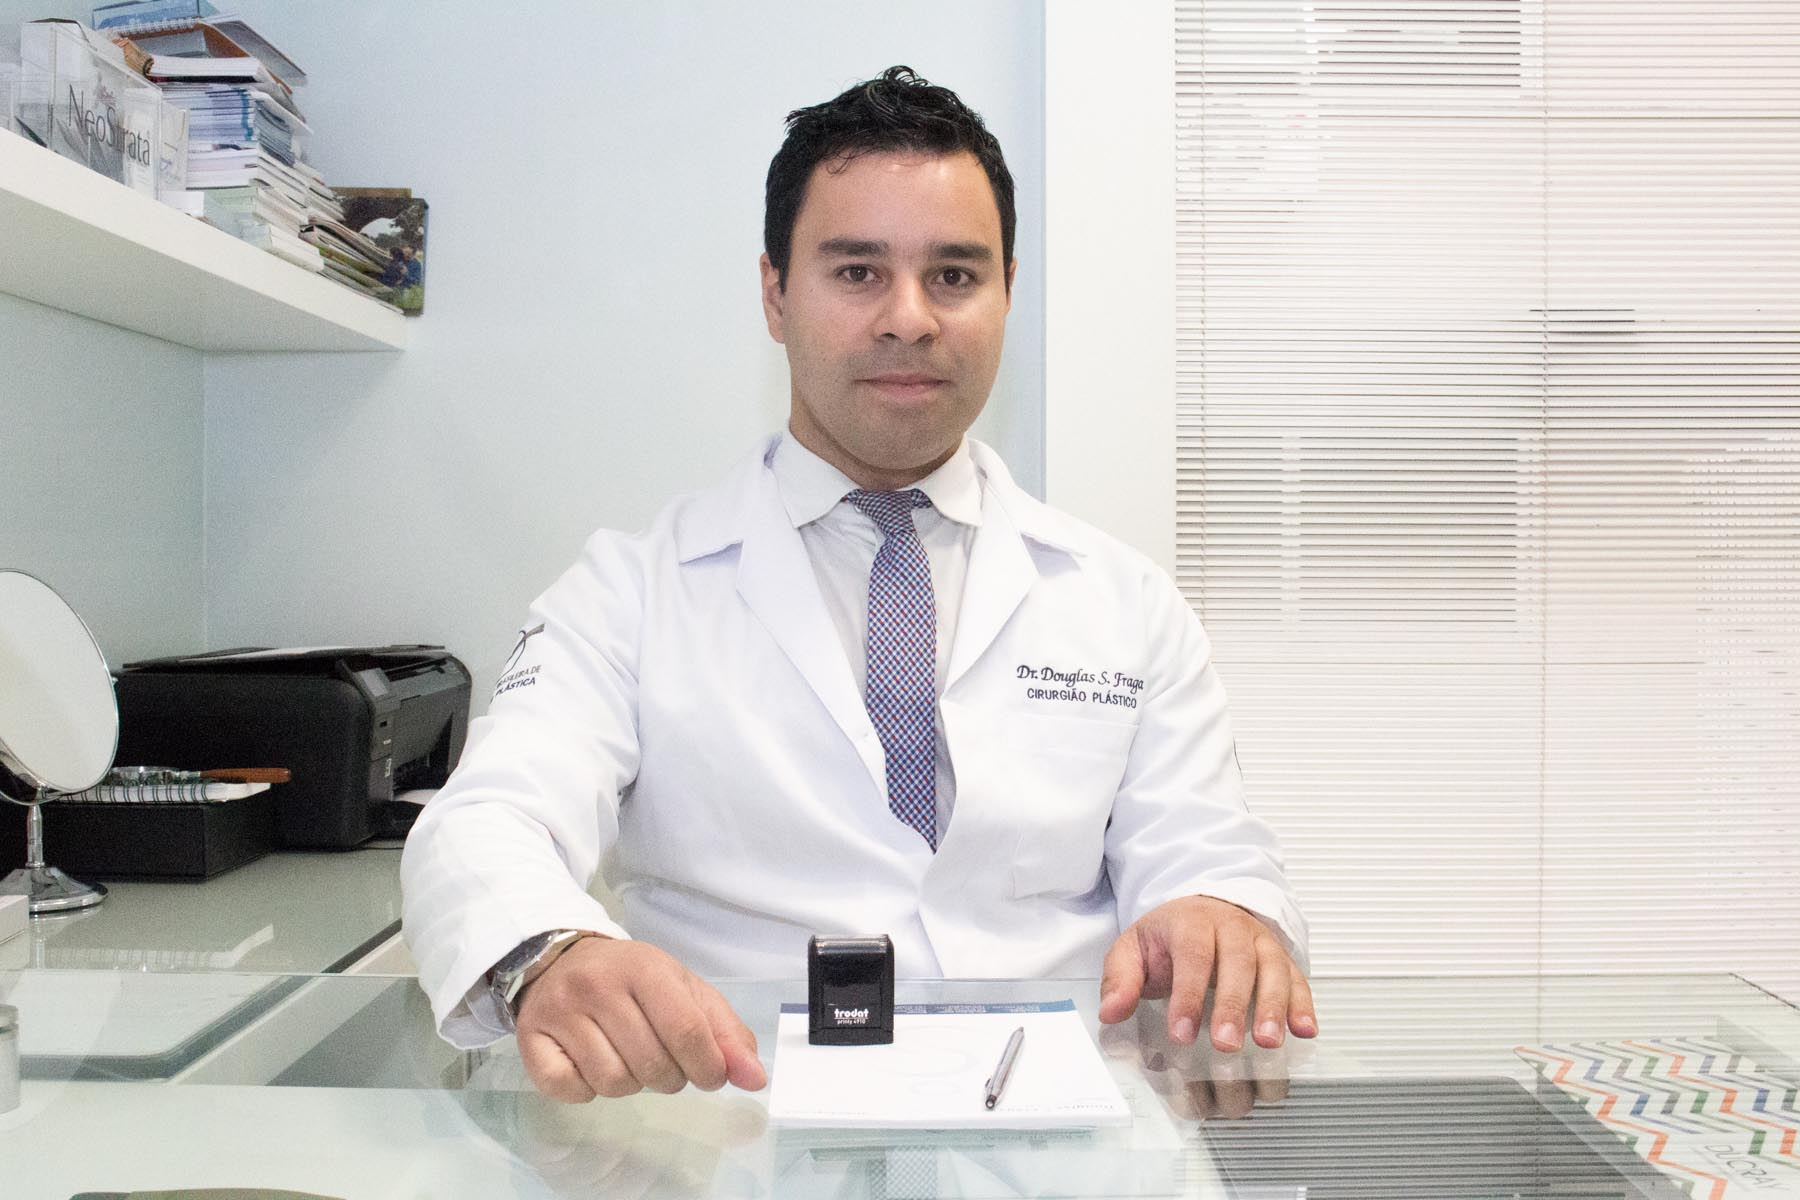 Dr. Douglas Fraga